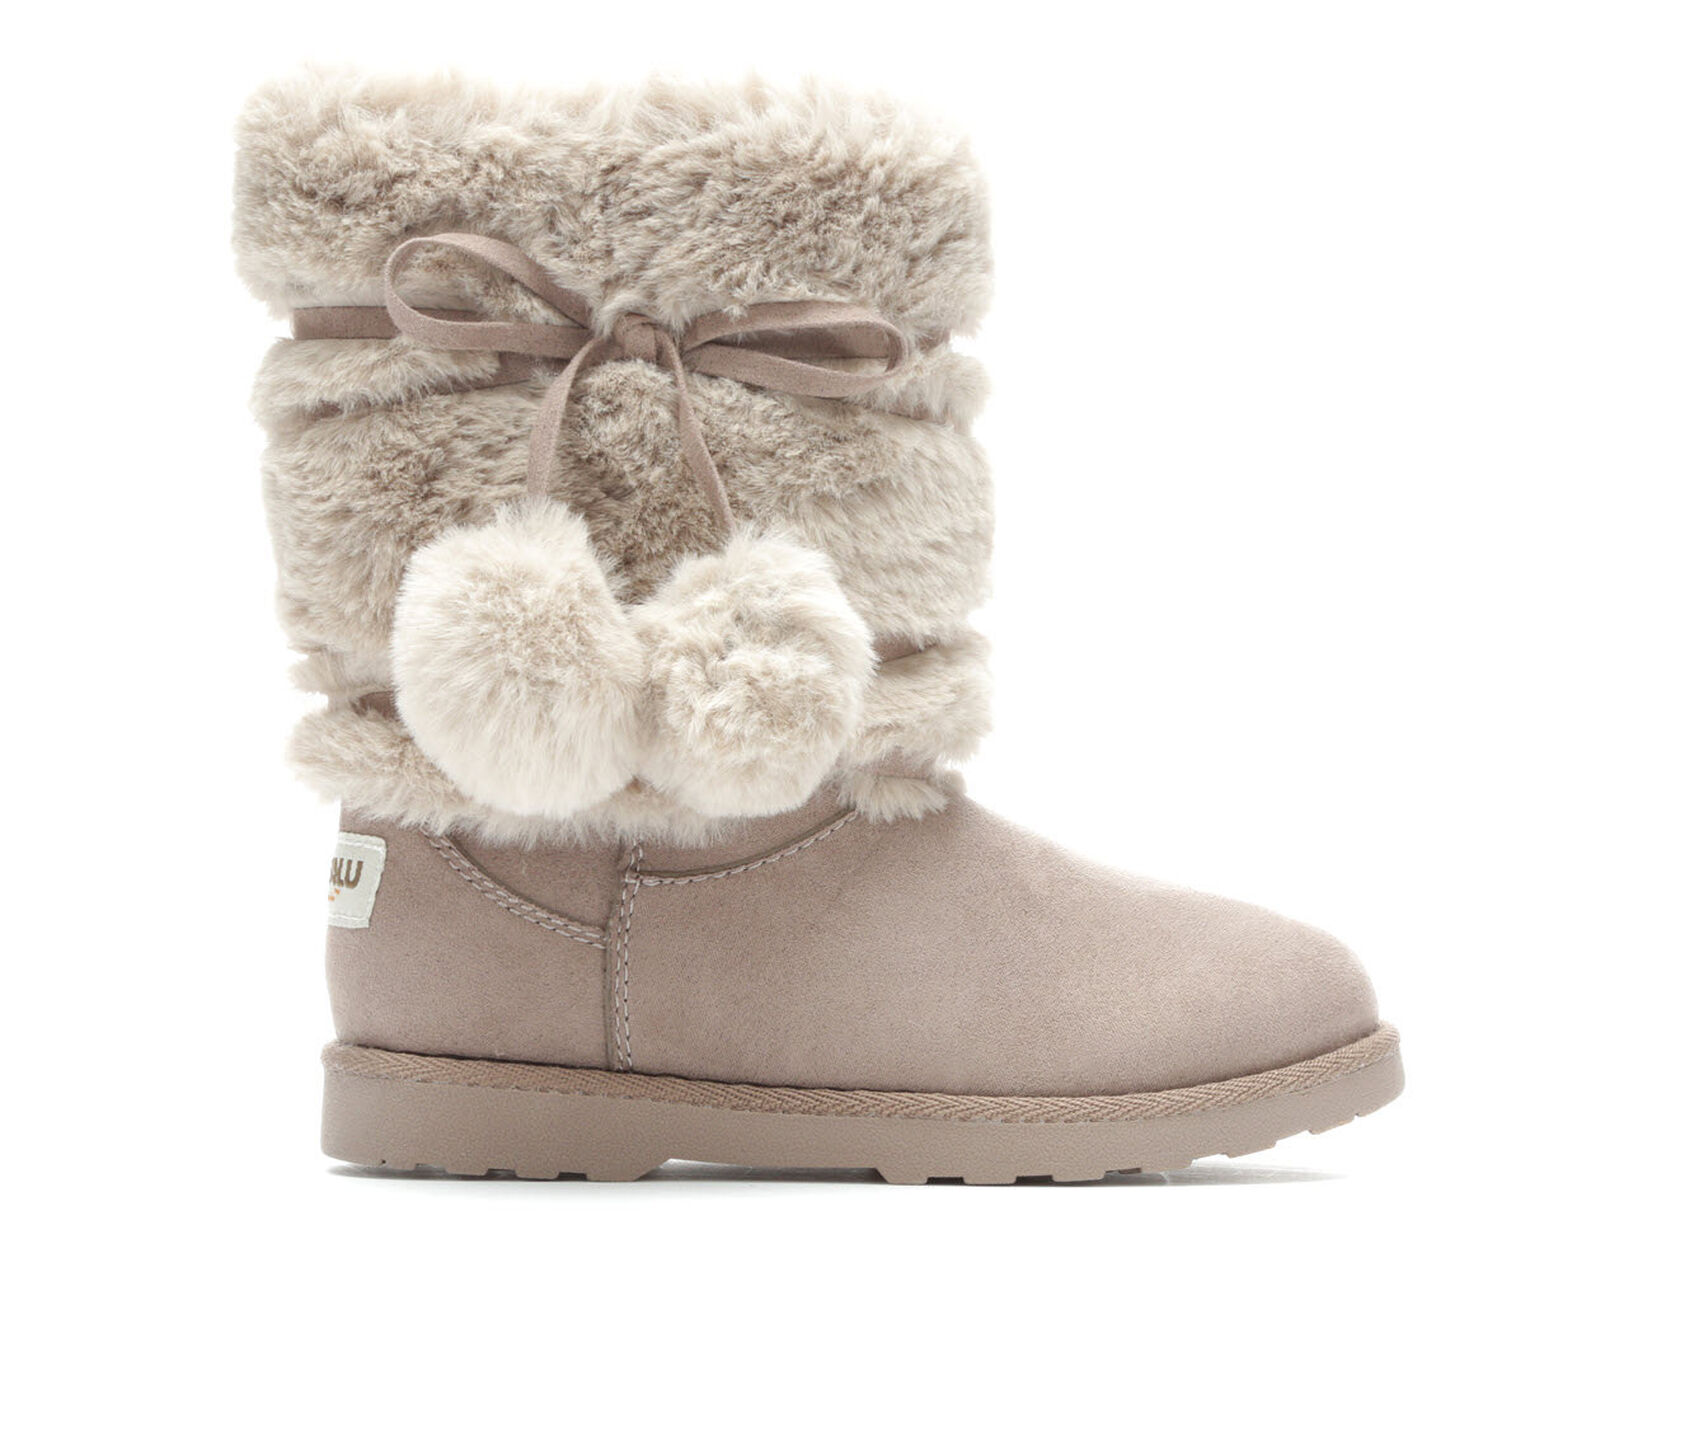 1bb0b8b6e8f Girls' Makalu Little Kid & Big Kid Cozy Land Boots | Shoe Carnival